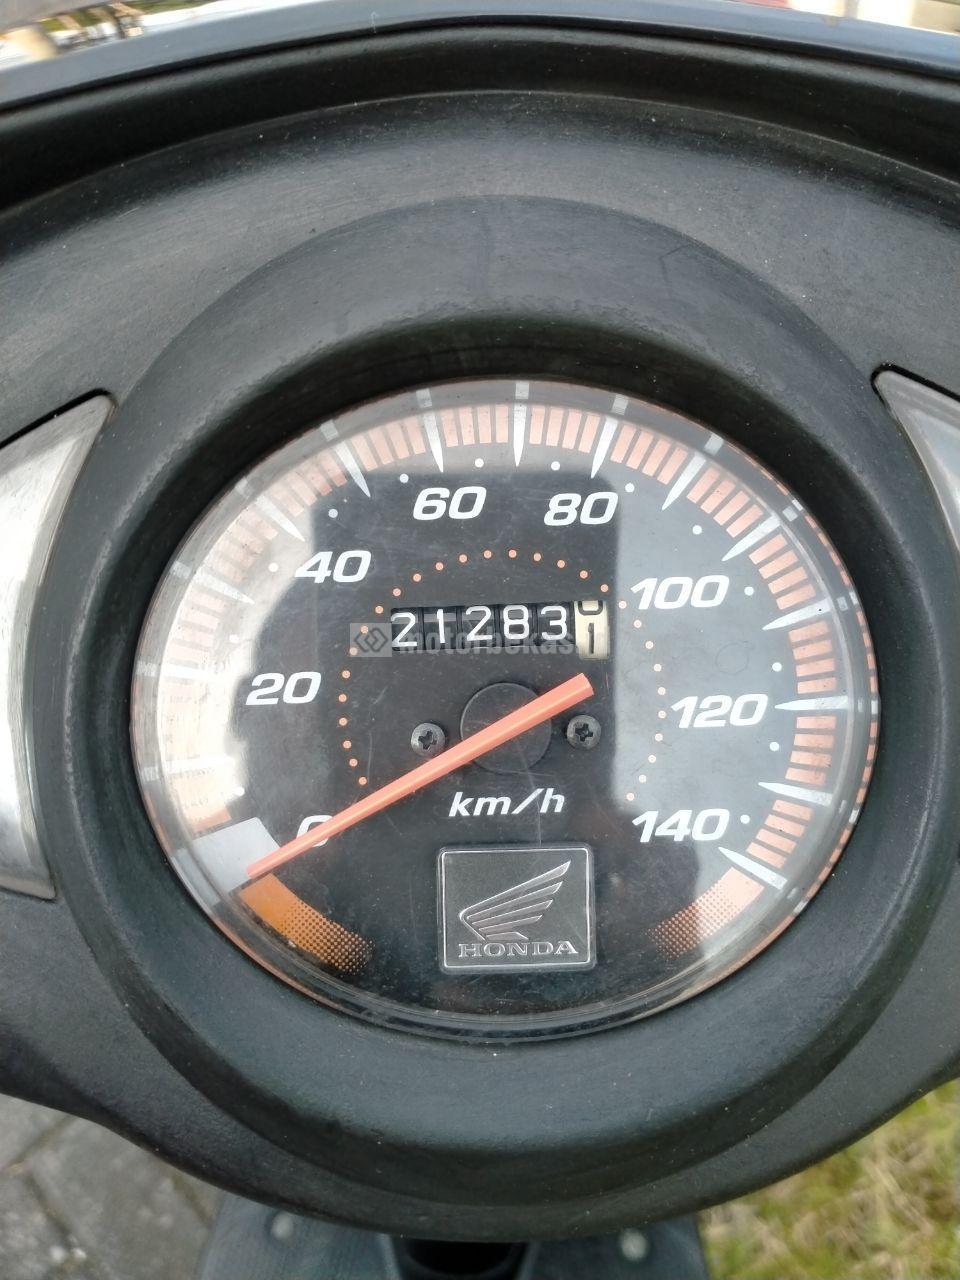 HONDA VARIO  3024 motorbekas.id